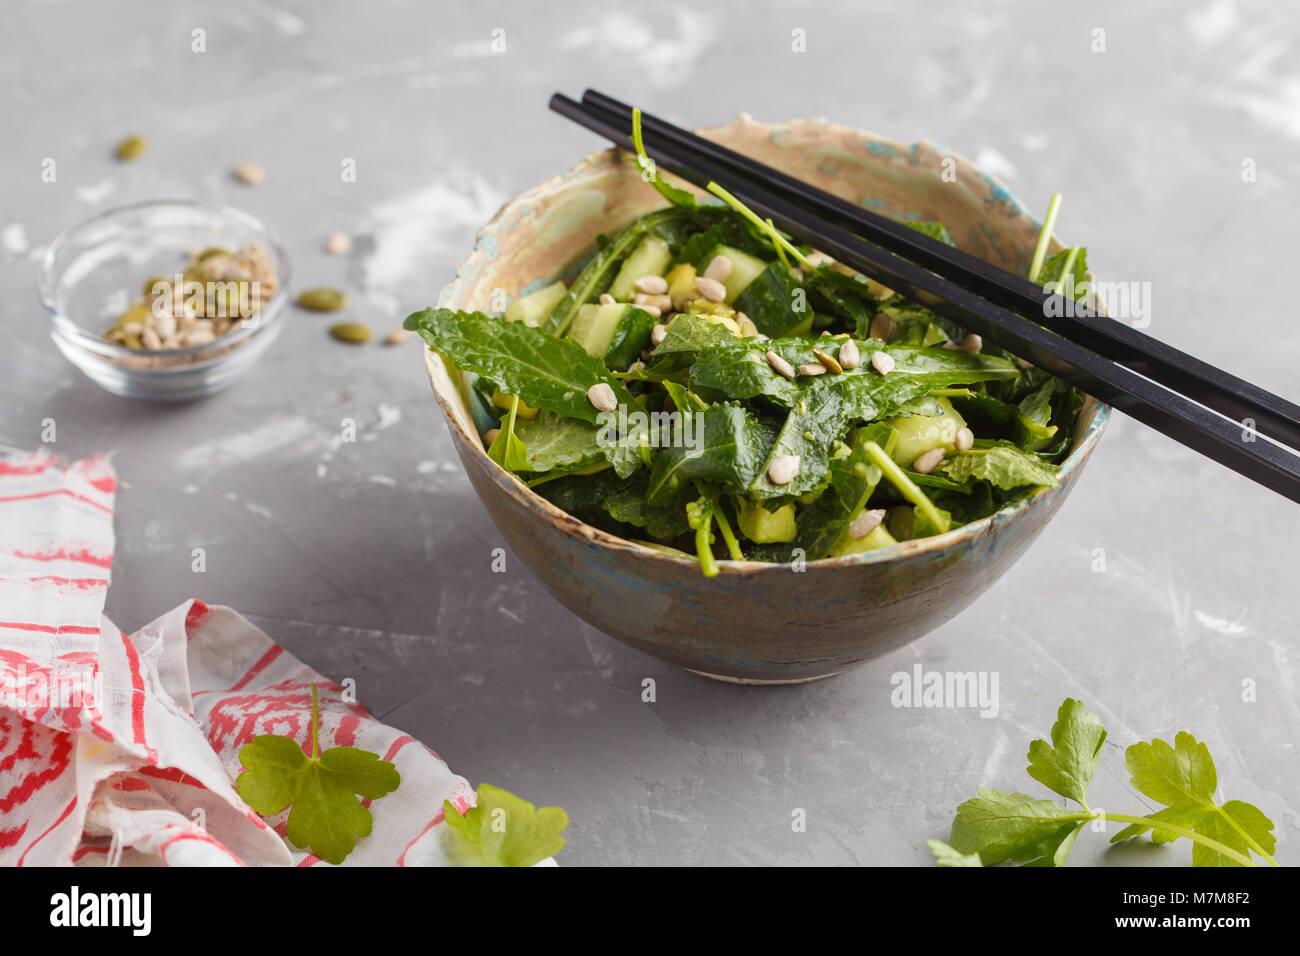 Vegan verde kale, pepino, semillas de girasol, ensalada. Concepto de comida vegetariana saludable. Imagen De Stock